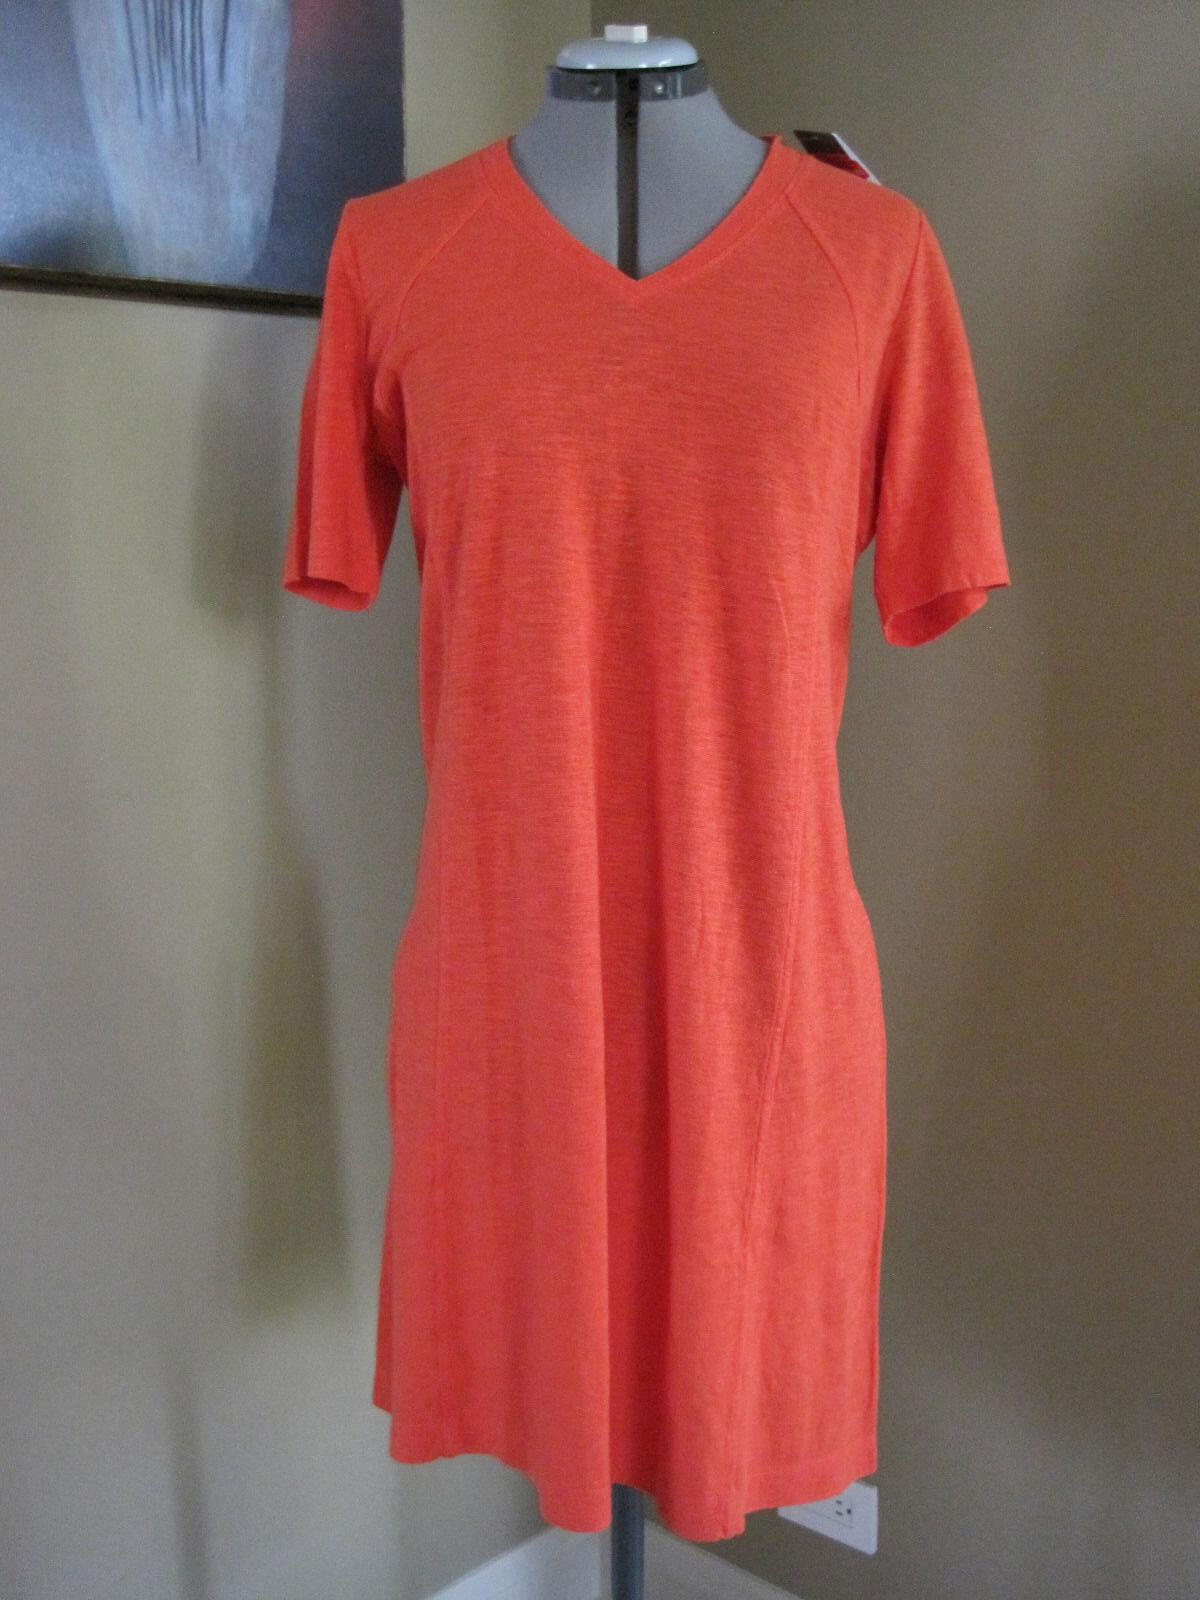 Neuf avec étiquettes Eileen Fisher chanvre Coton Bio Col V à hommeches courtes robe taille S